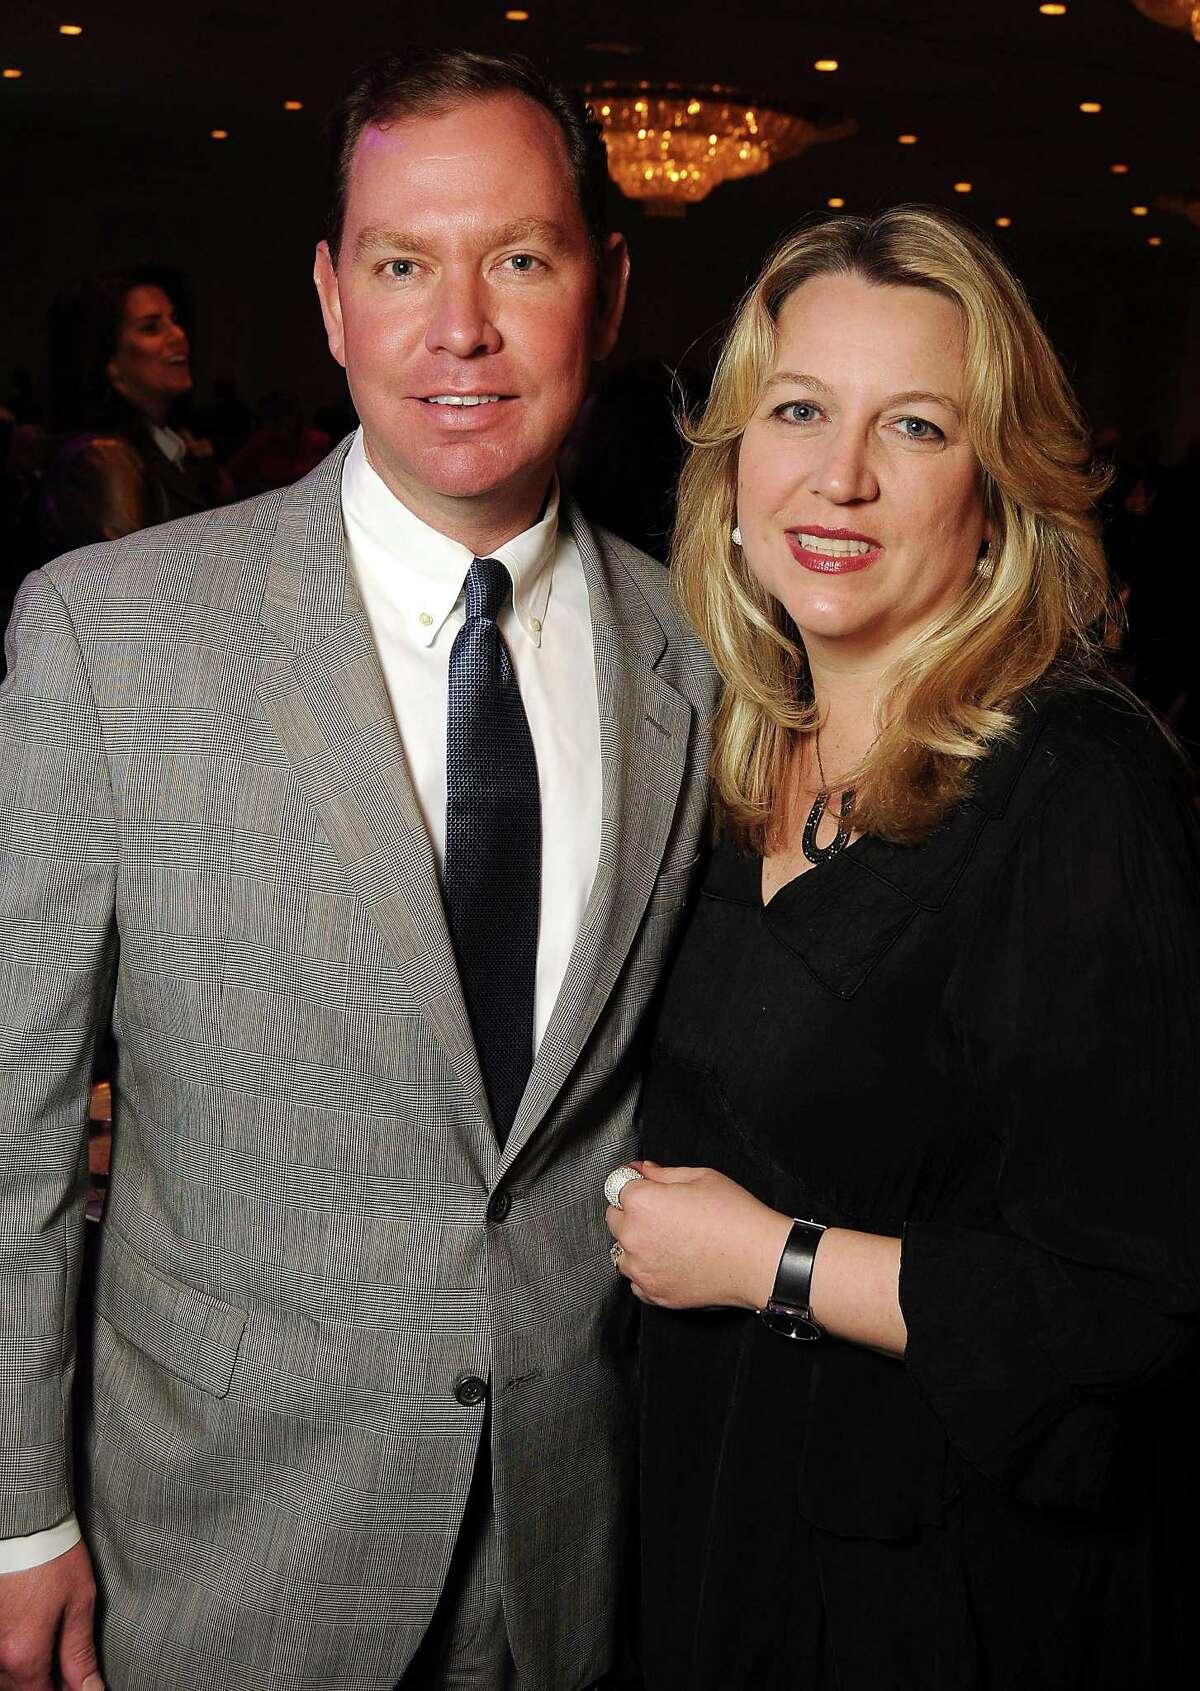 Richard Kroger and Cheryl Strayed